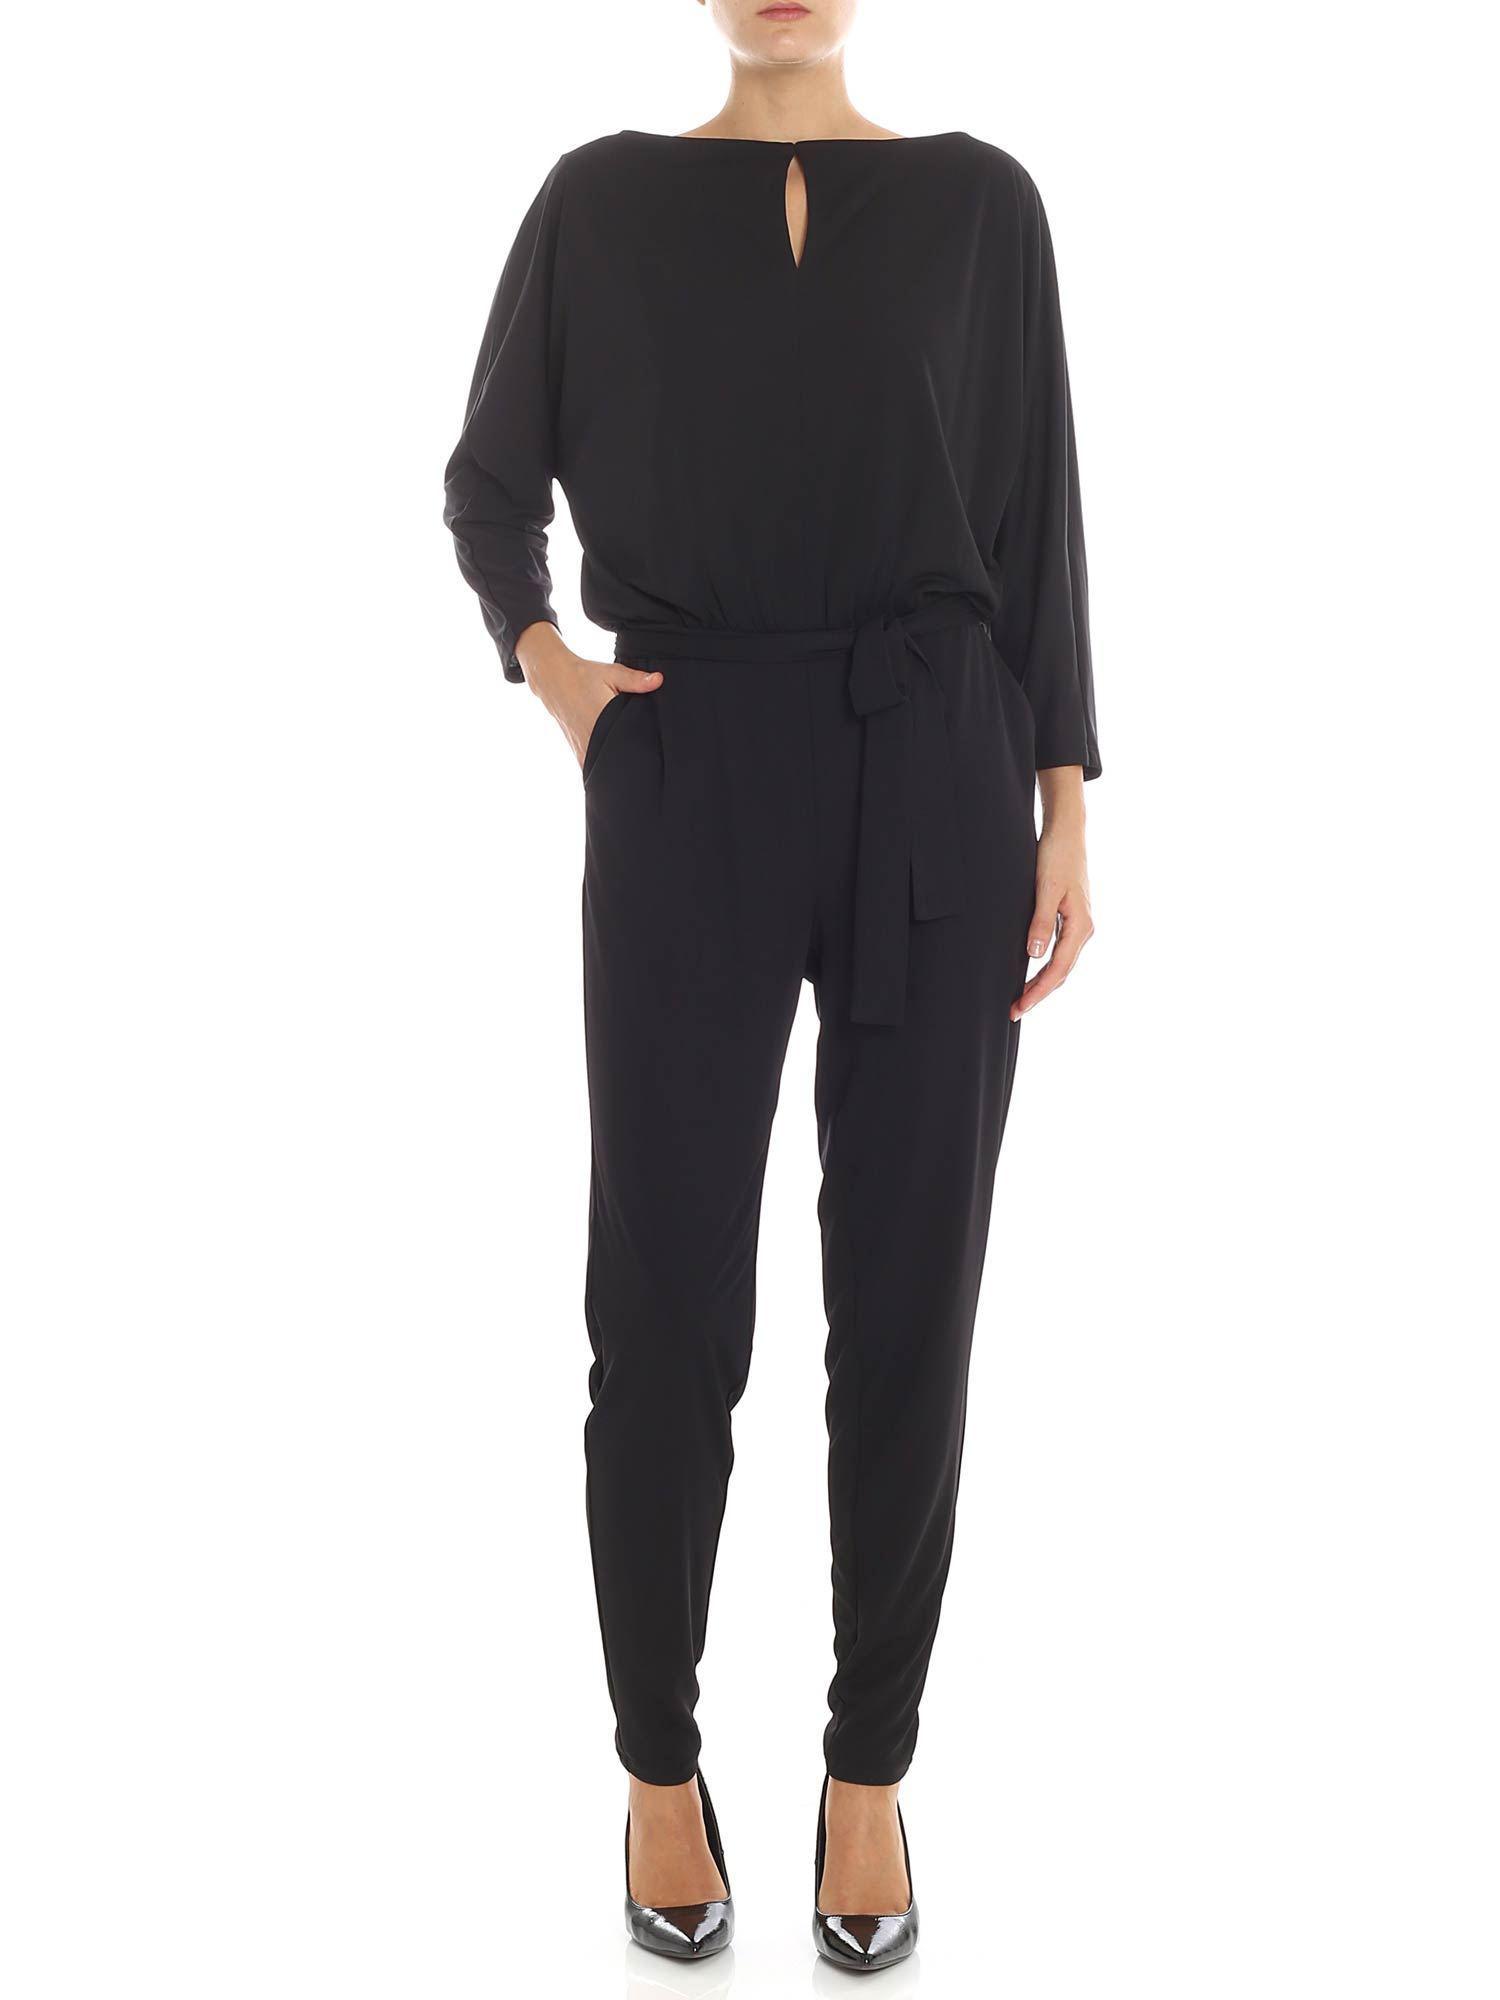 f0382a62066 Lyst - Lauren by Ralph Lauren Black Long Slevees Jumpsuit in Black